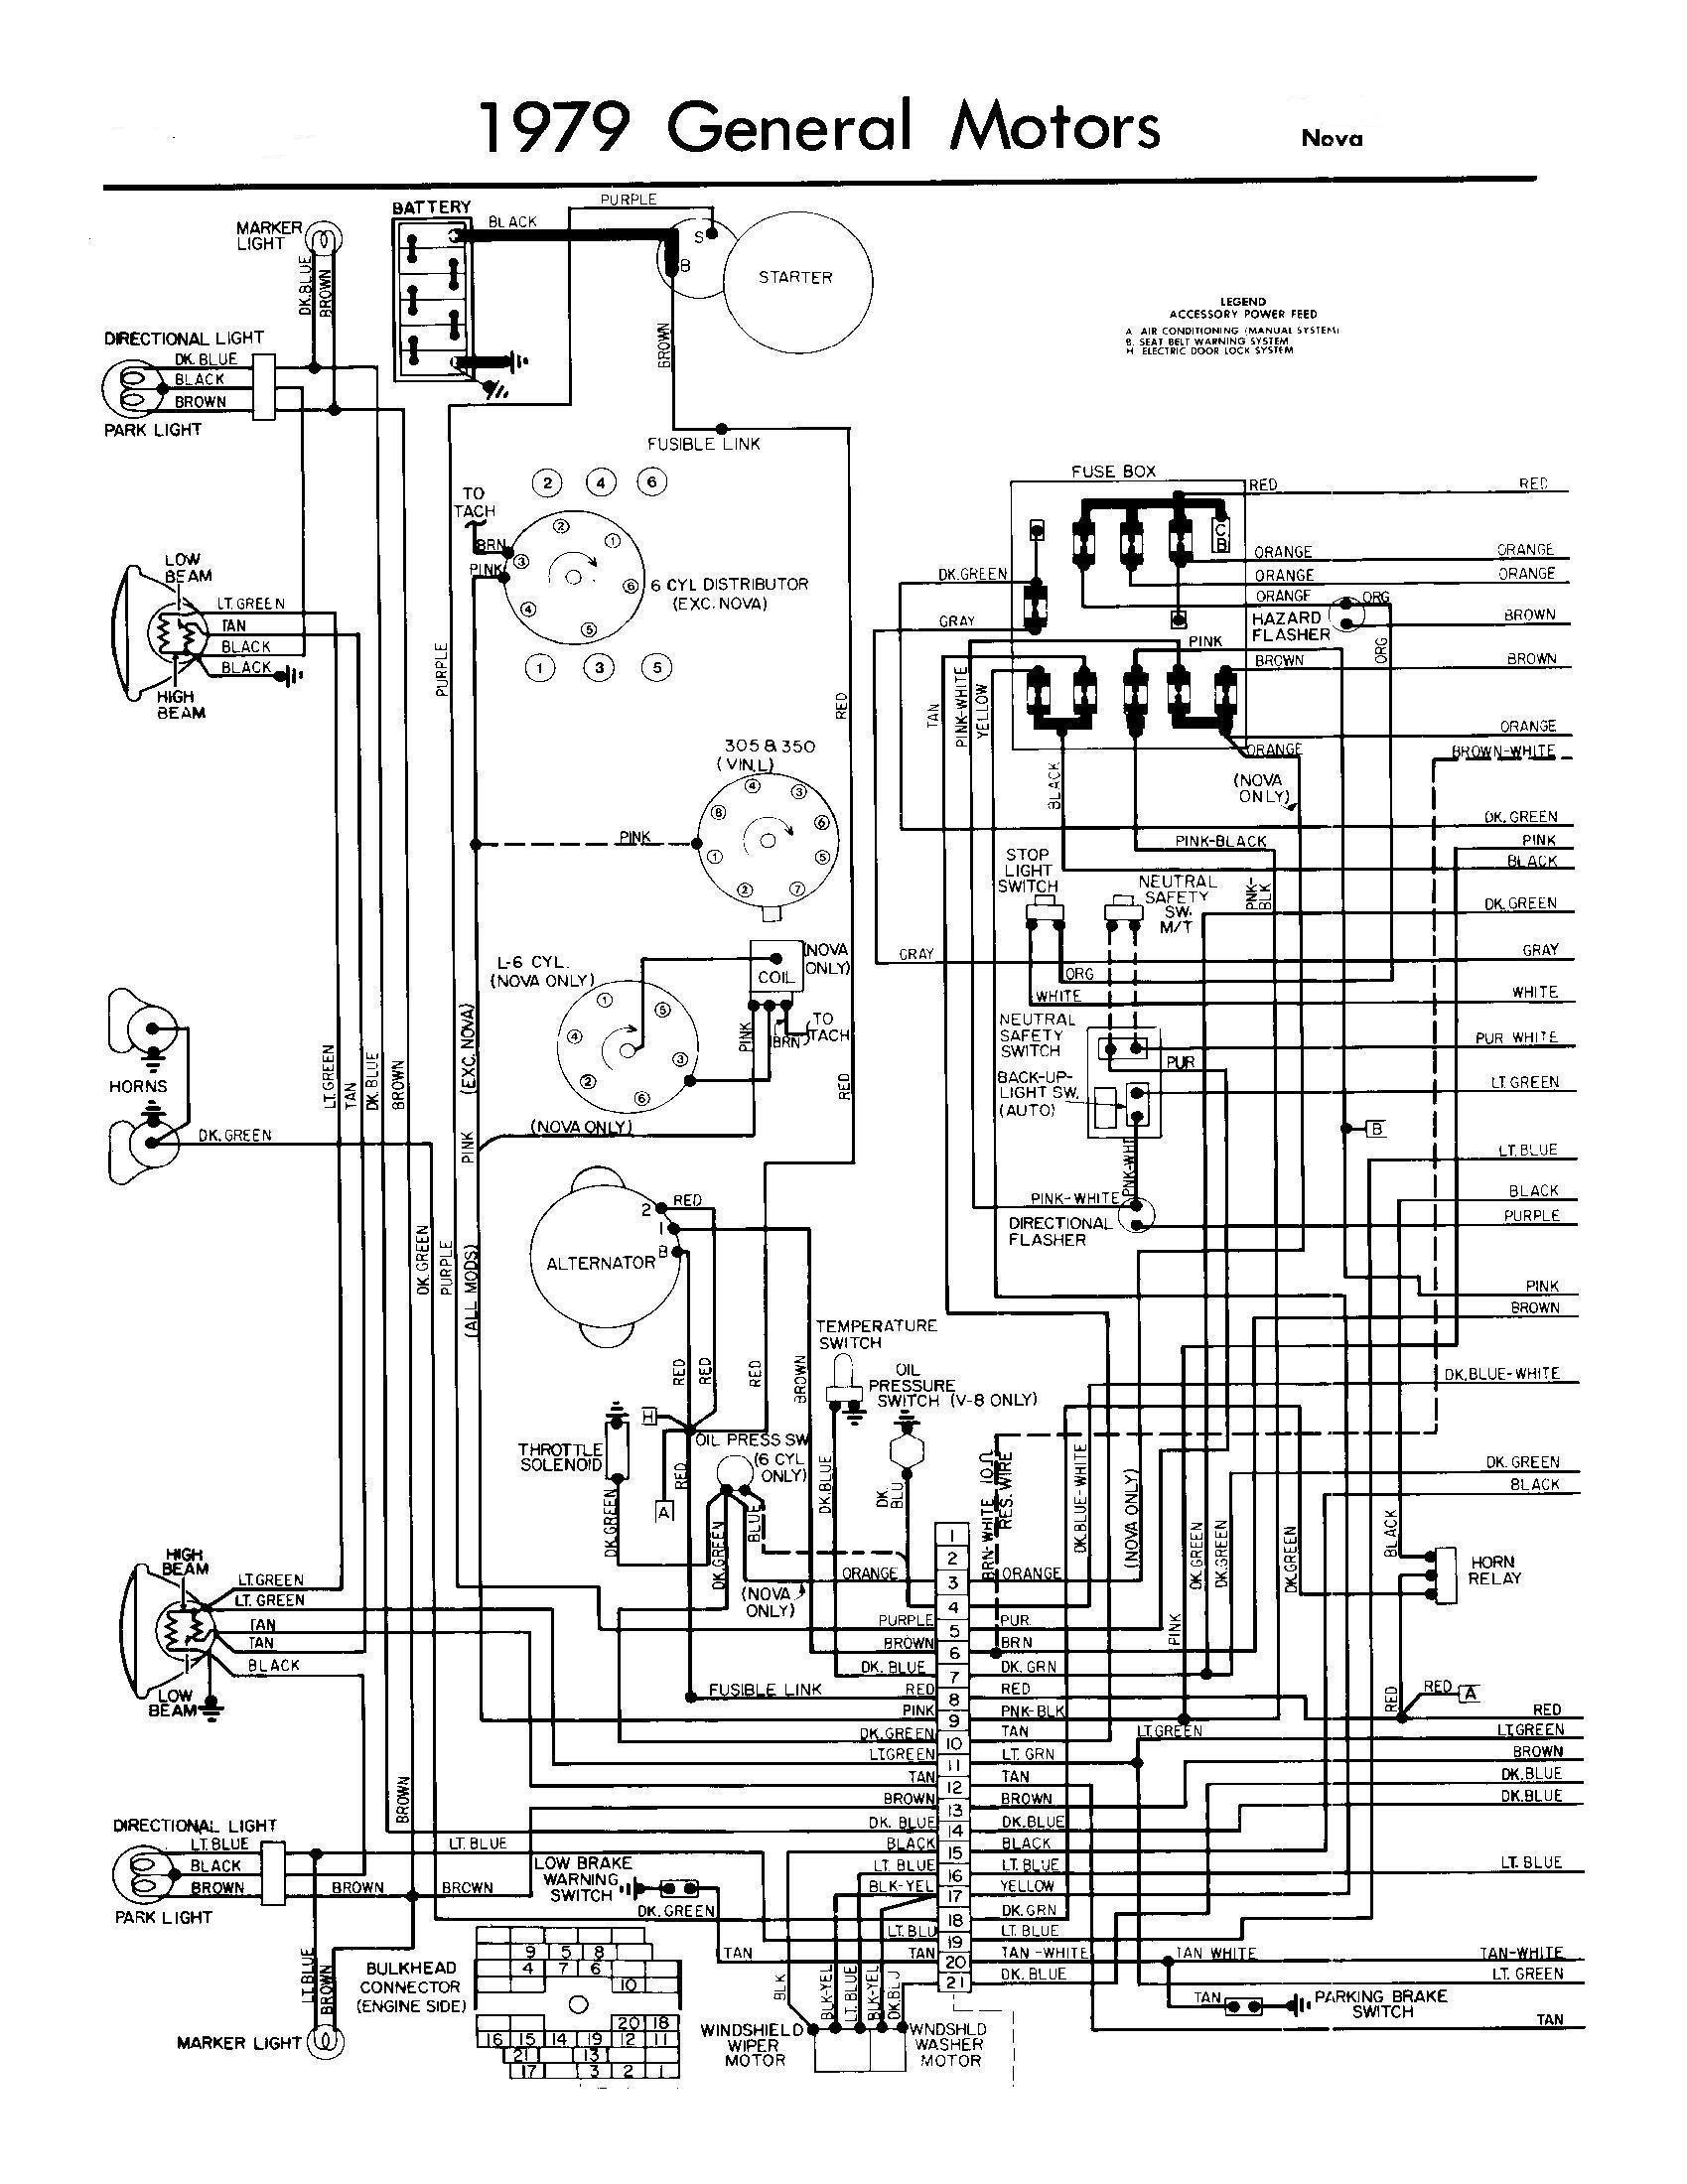 Ready Remote Wiring Diagram Volvo Mp7 Engine Head Diagram Wiring Diagram Local